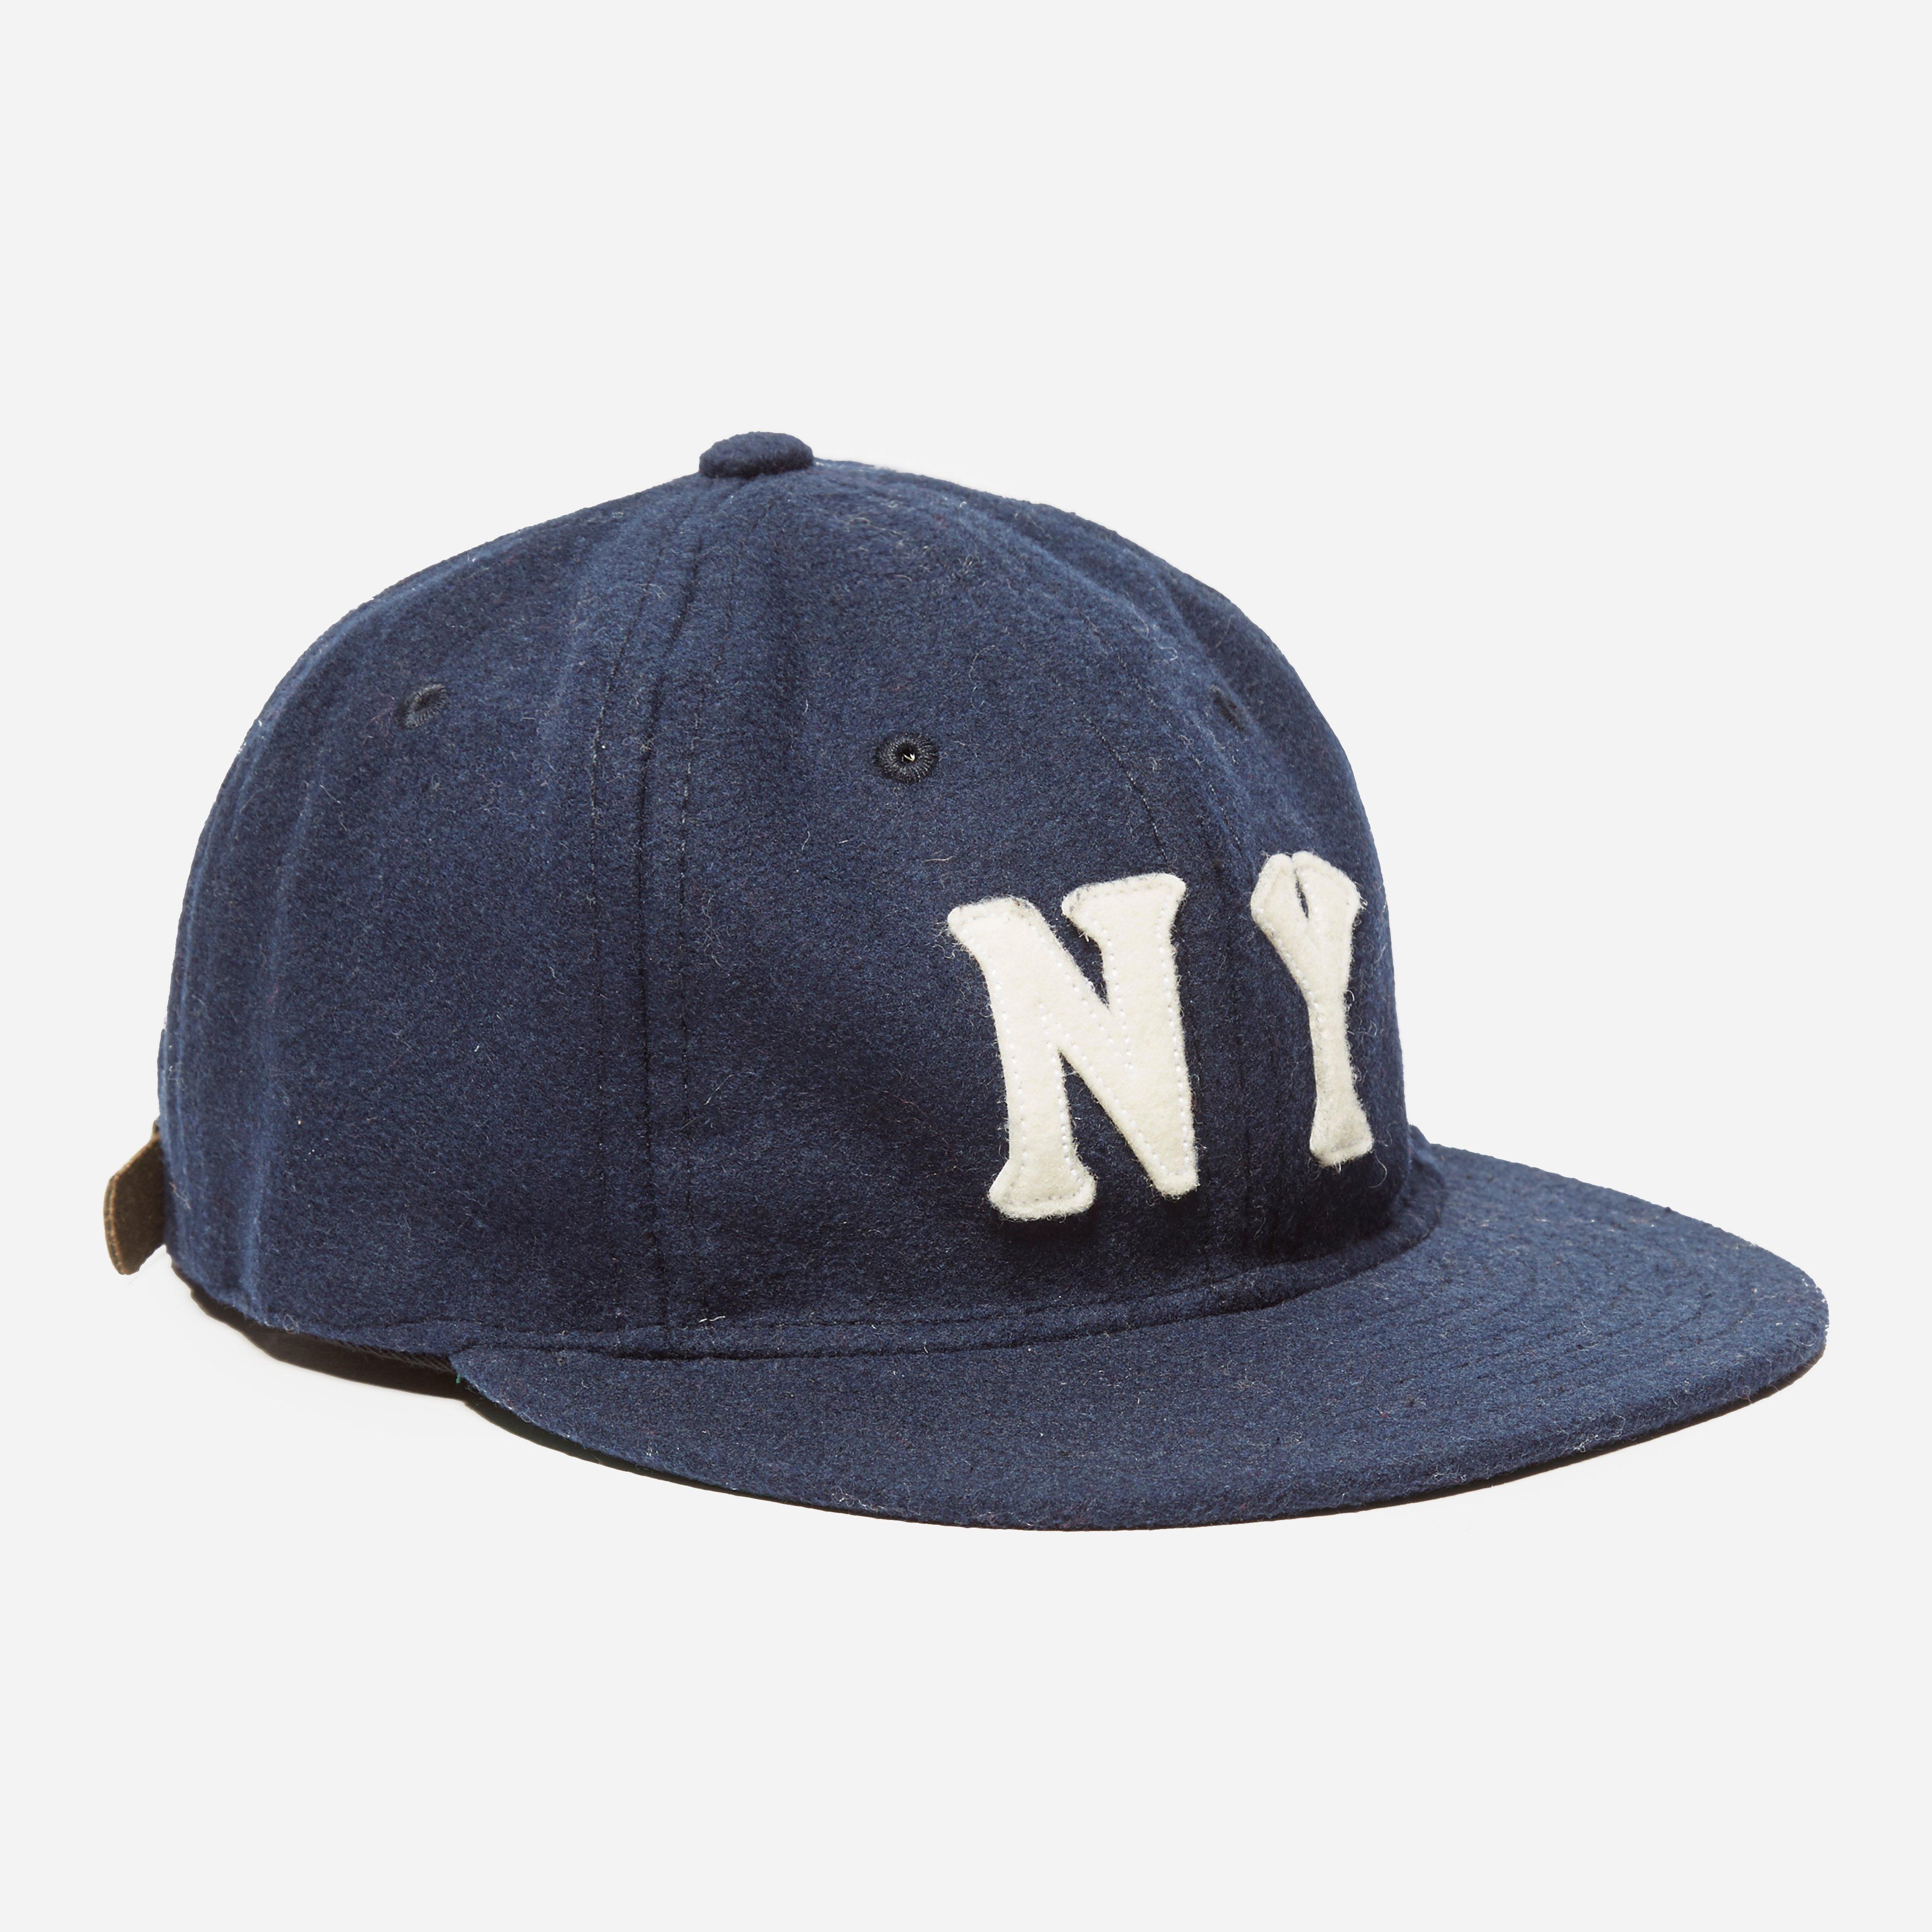 Ebbets New York Black Yankees 1936 Cap Navy Wool